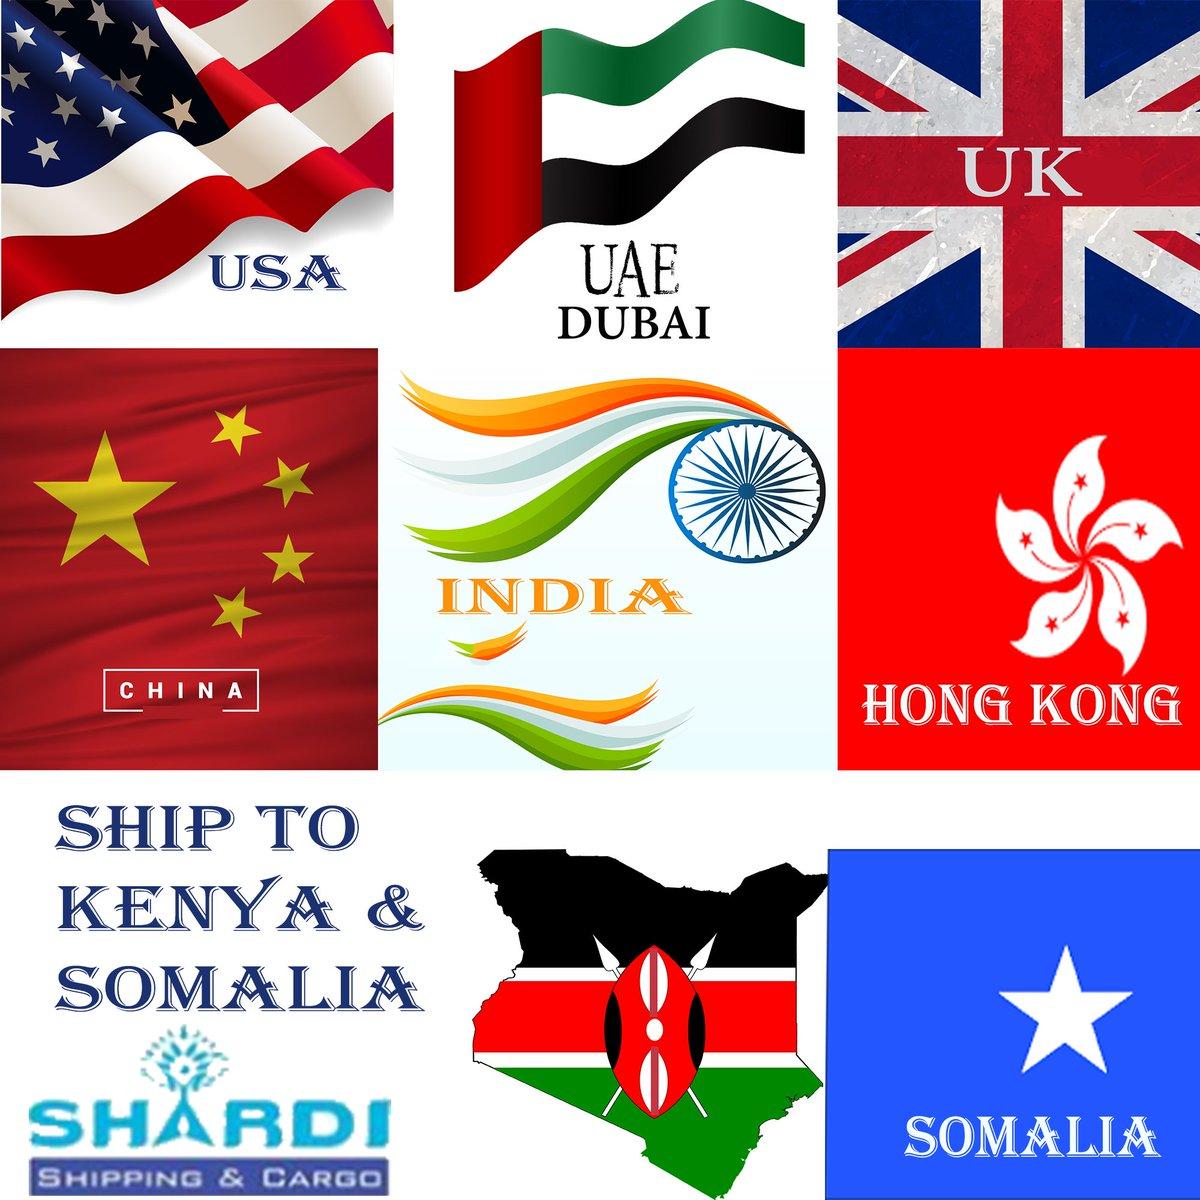 Shardi Shipping and Cargo on Twitter: